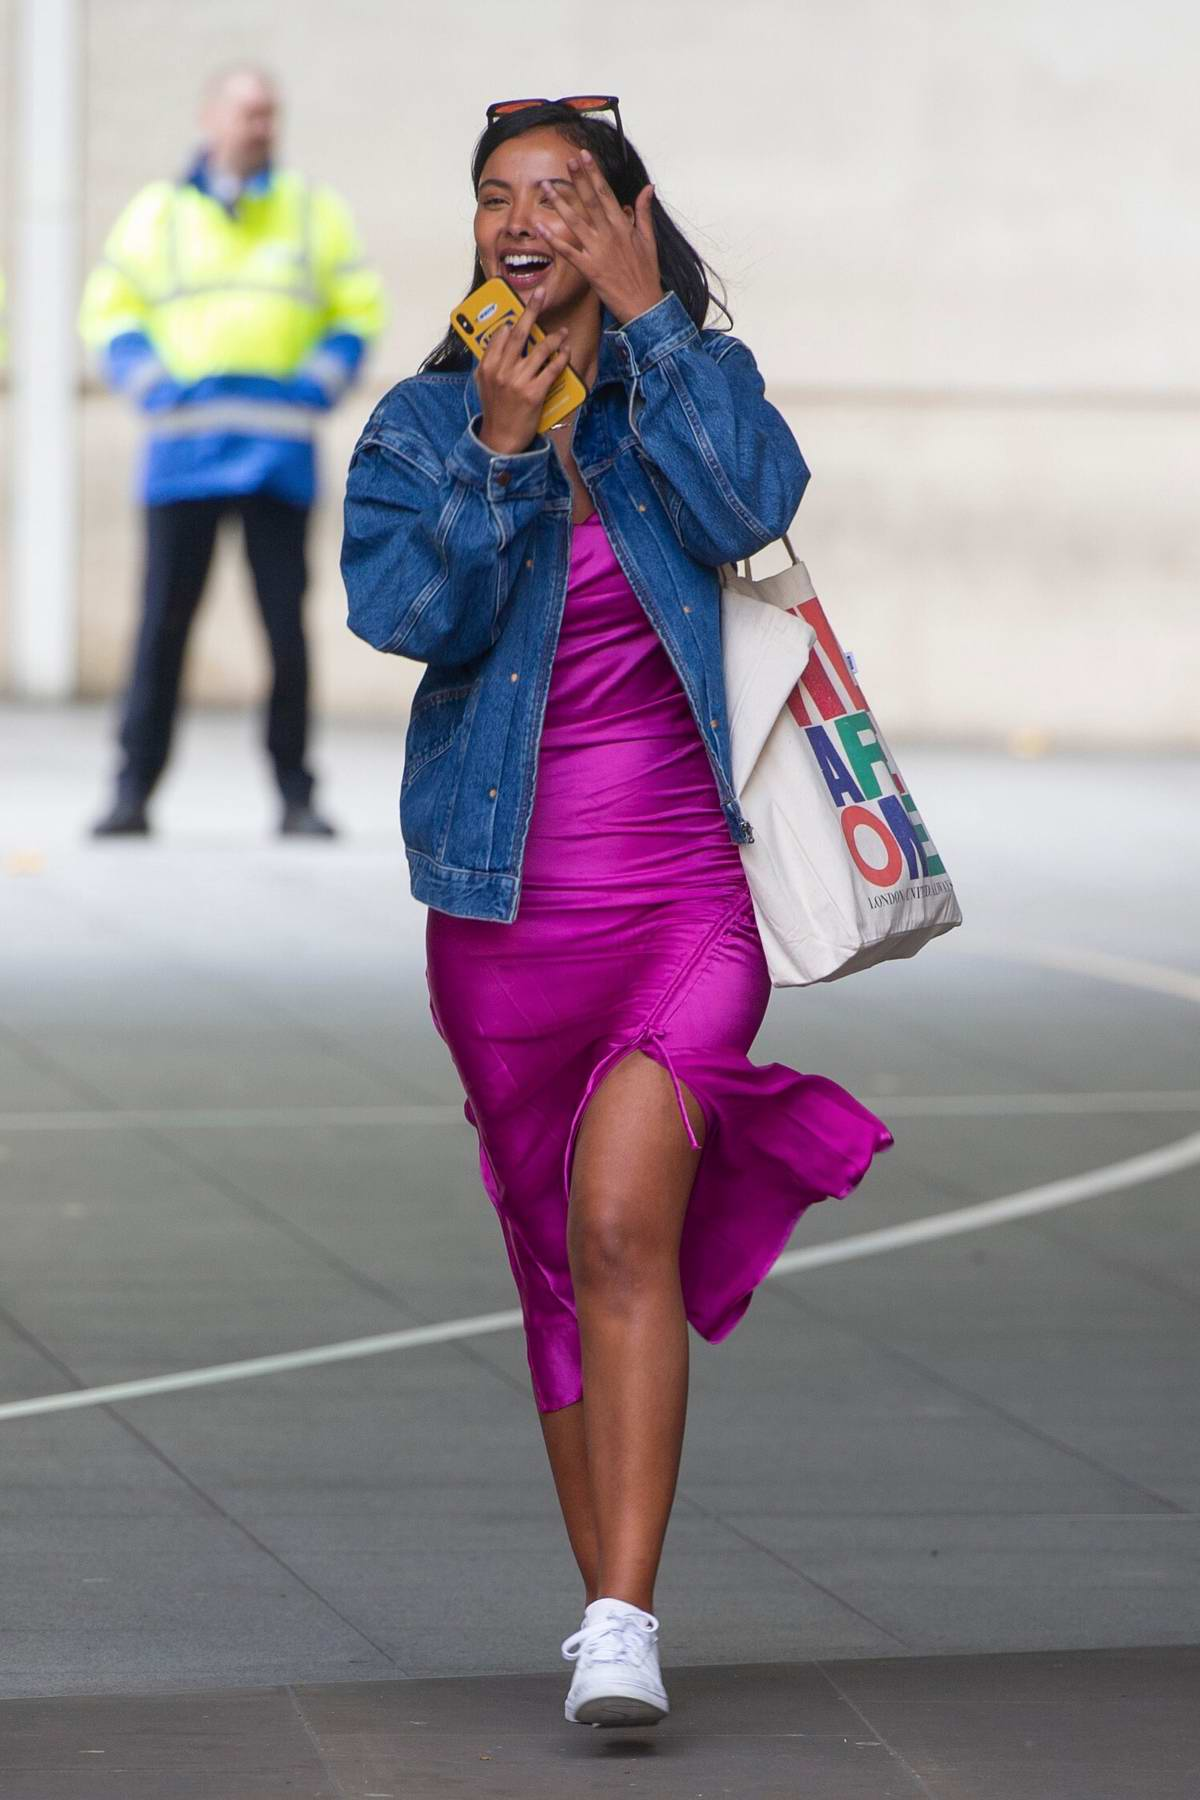 Maya Jama seen wearing a magenta pink slit dress as she arrives at BBC Radio One studios in London, UK